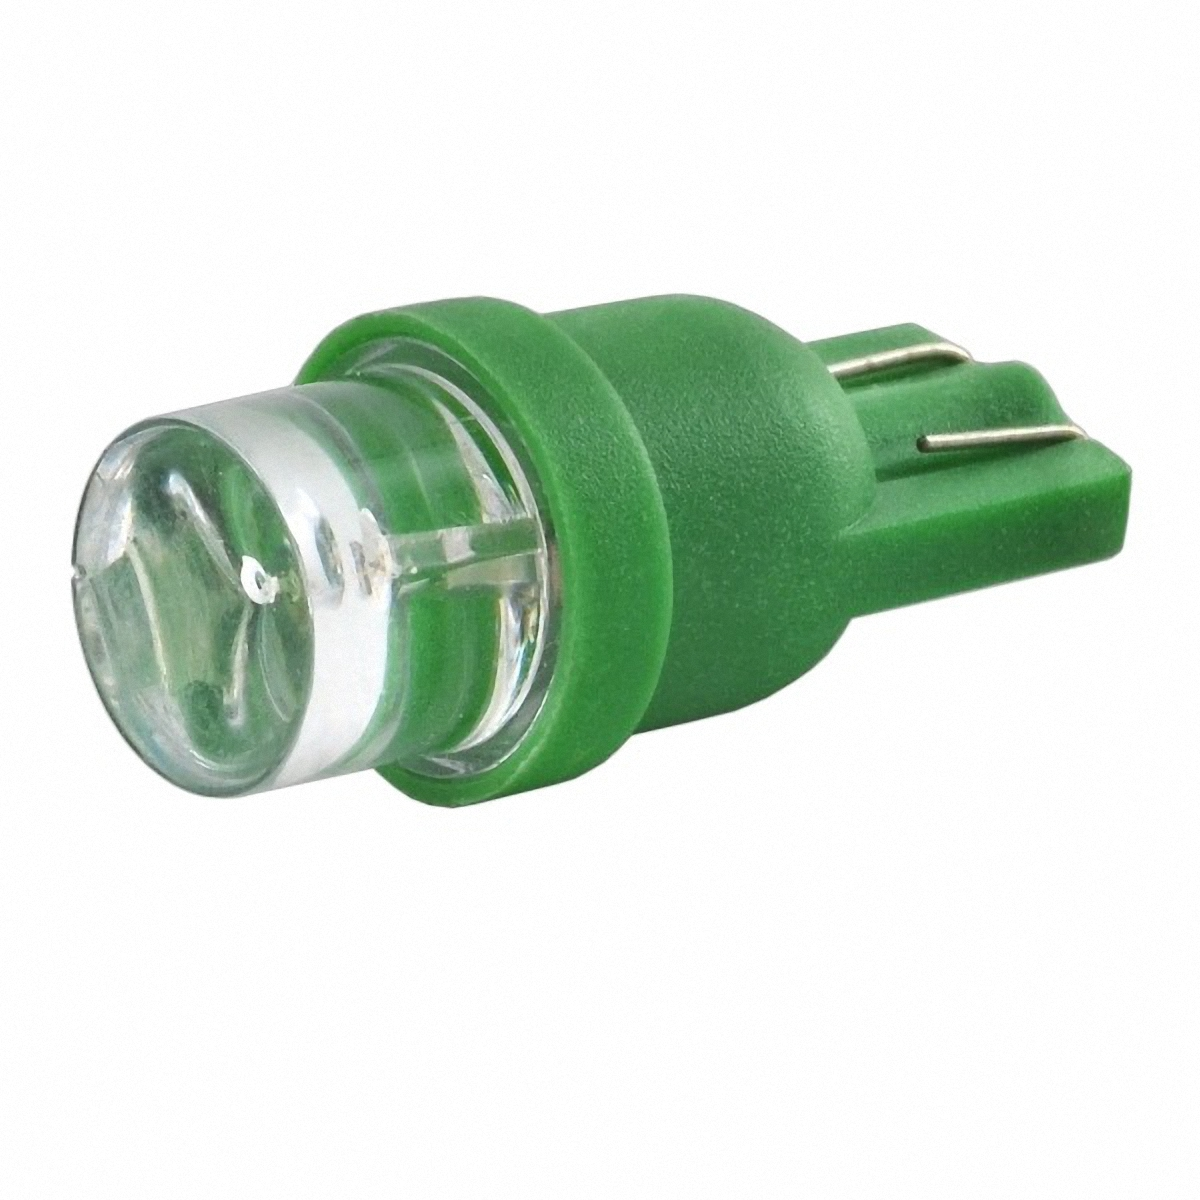 Skyway Автолампа диод T10 (W5W). ST10-1led (вогнутая) G (T10-1LED G)ST10-1led (вогнутая) G (T10-1LED G)1 диод без цоколя 1-контактная Конус Зеленая